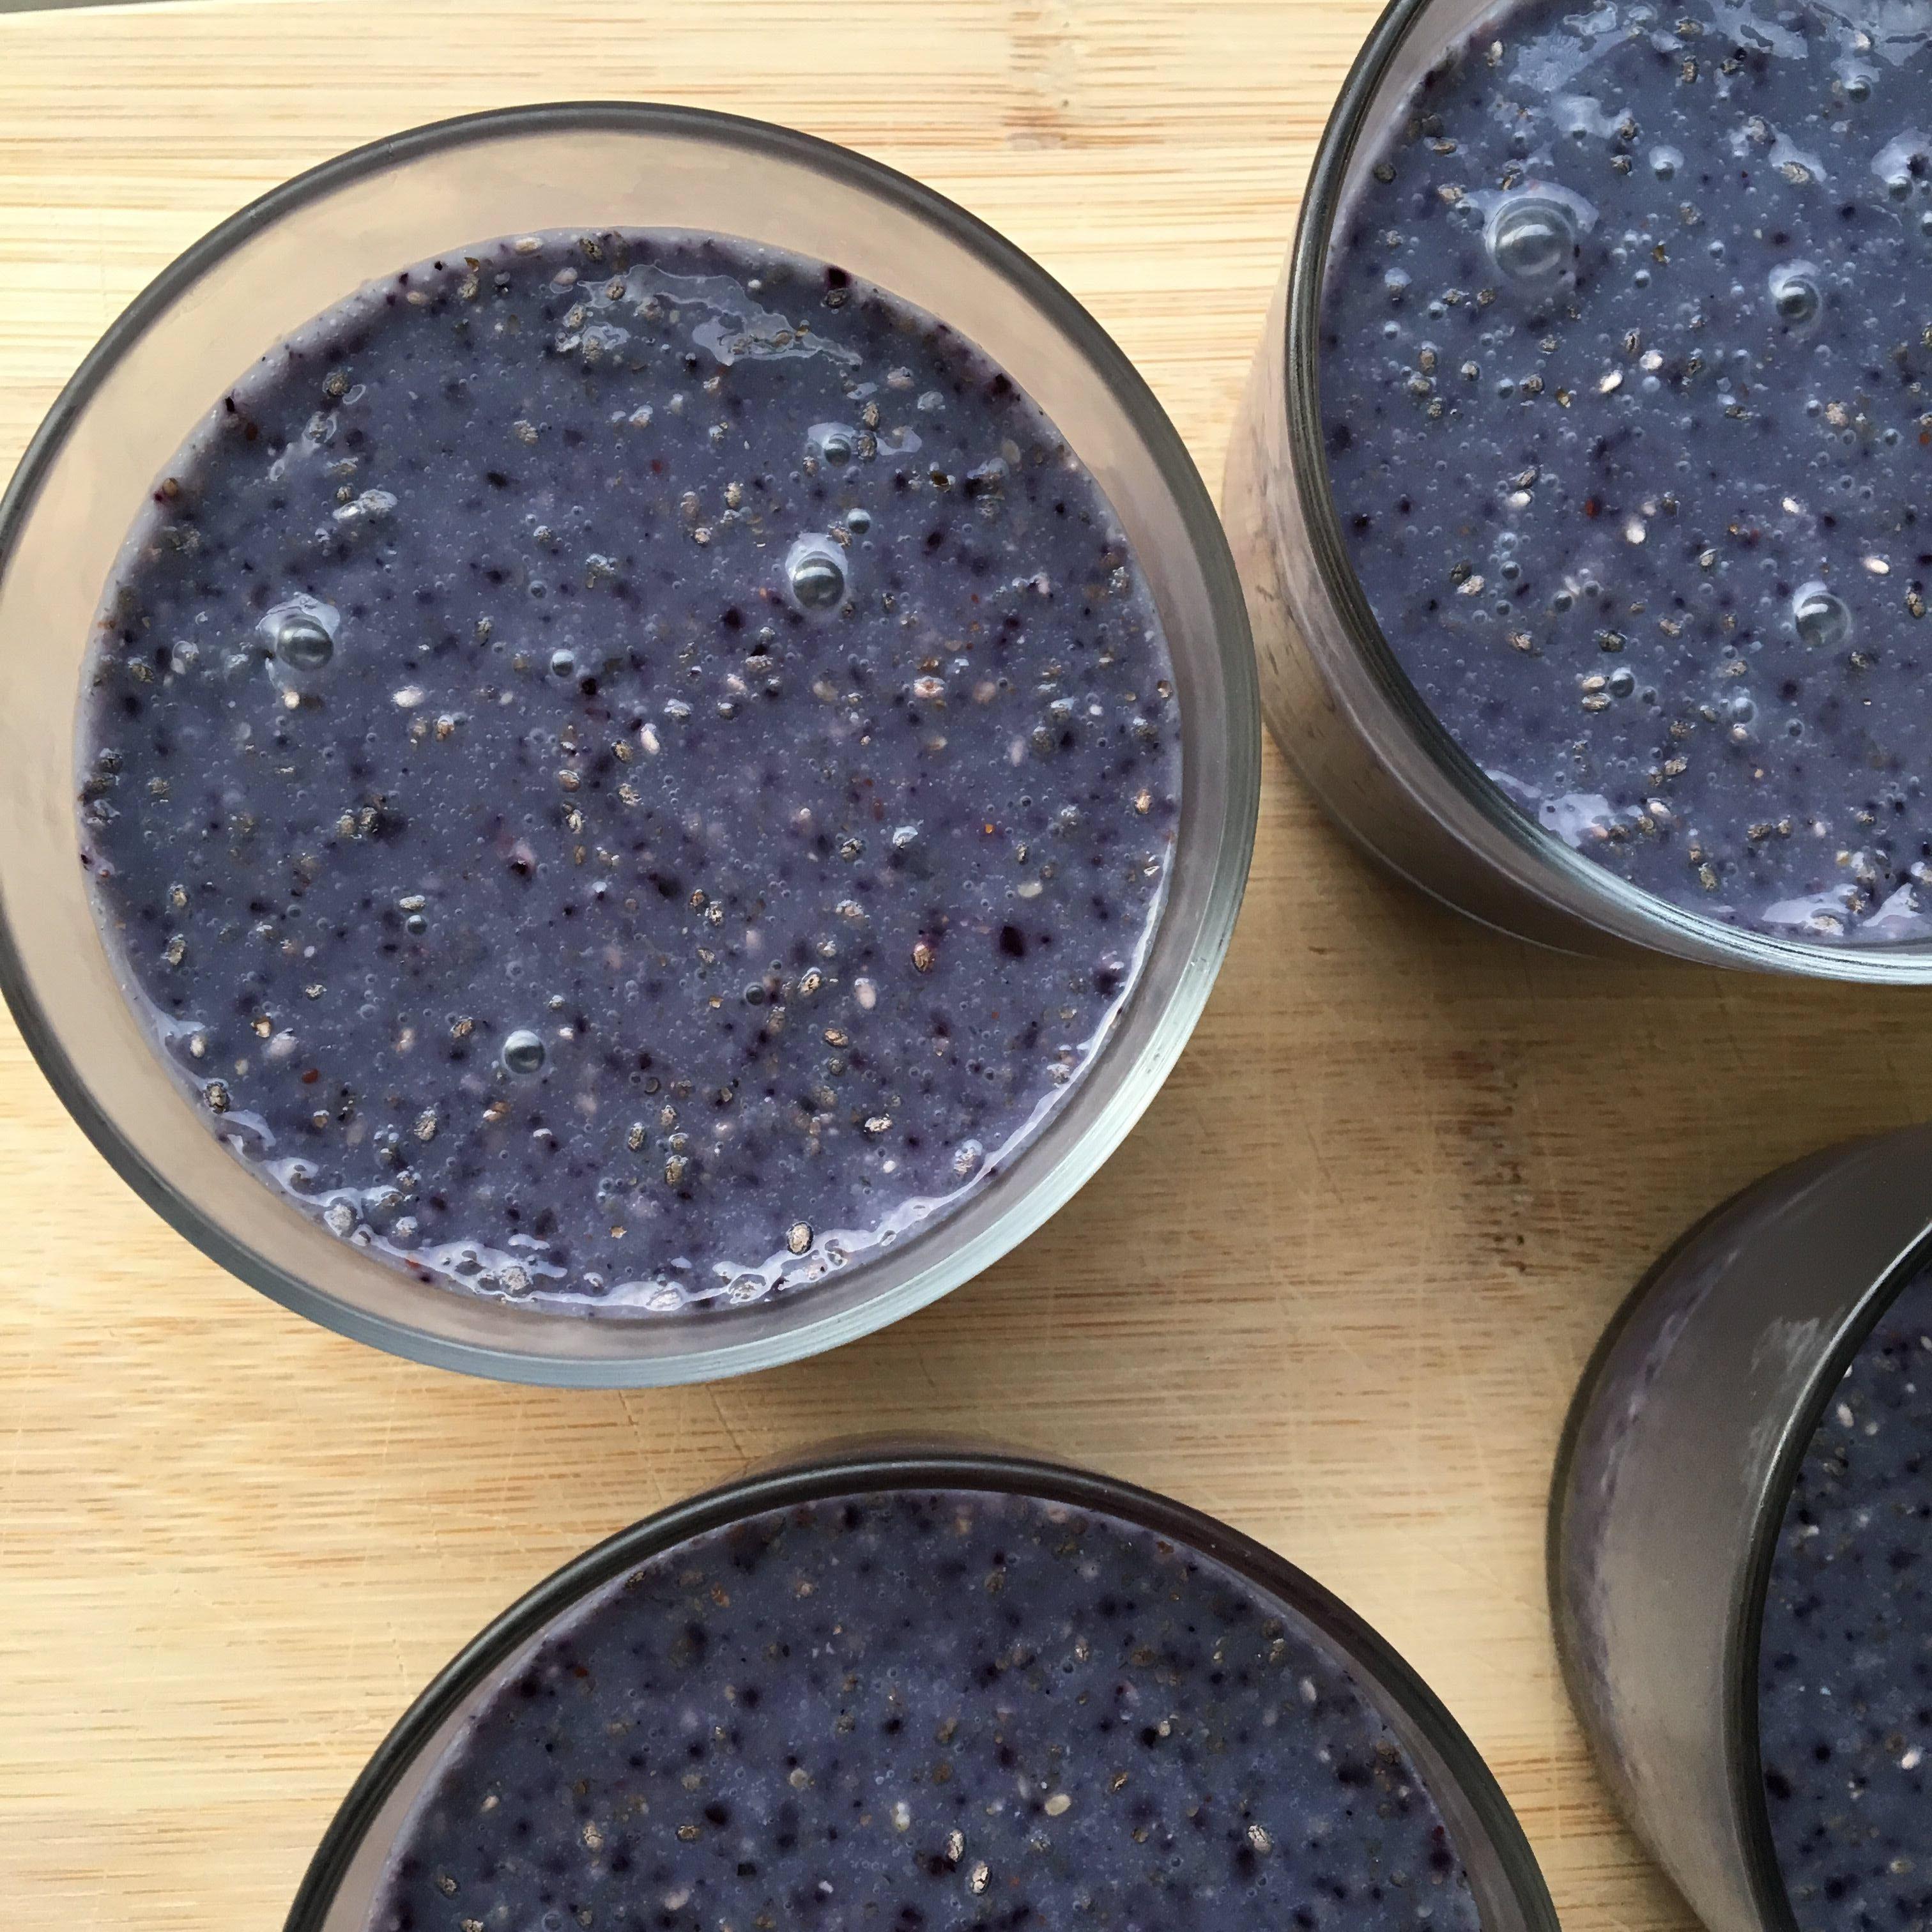 Blueberry Chia Pudding with Almond Milk AllrecipesPhoto